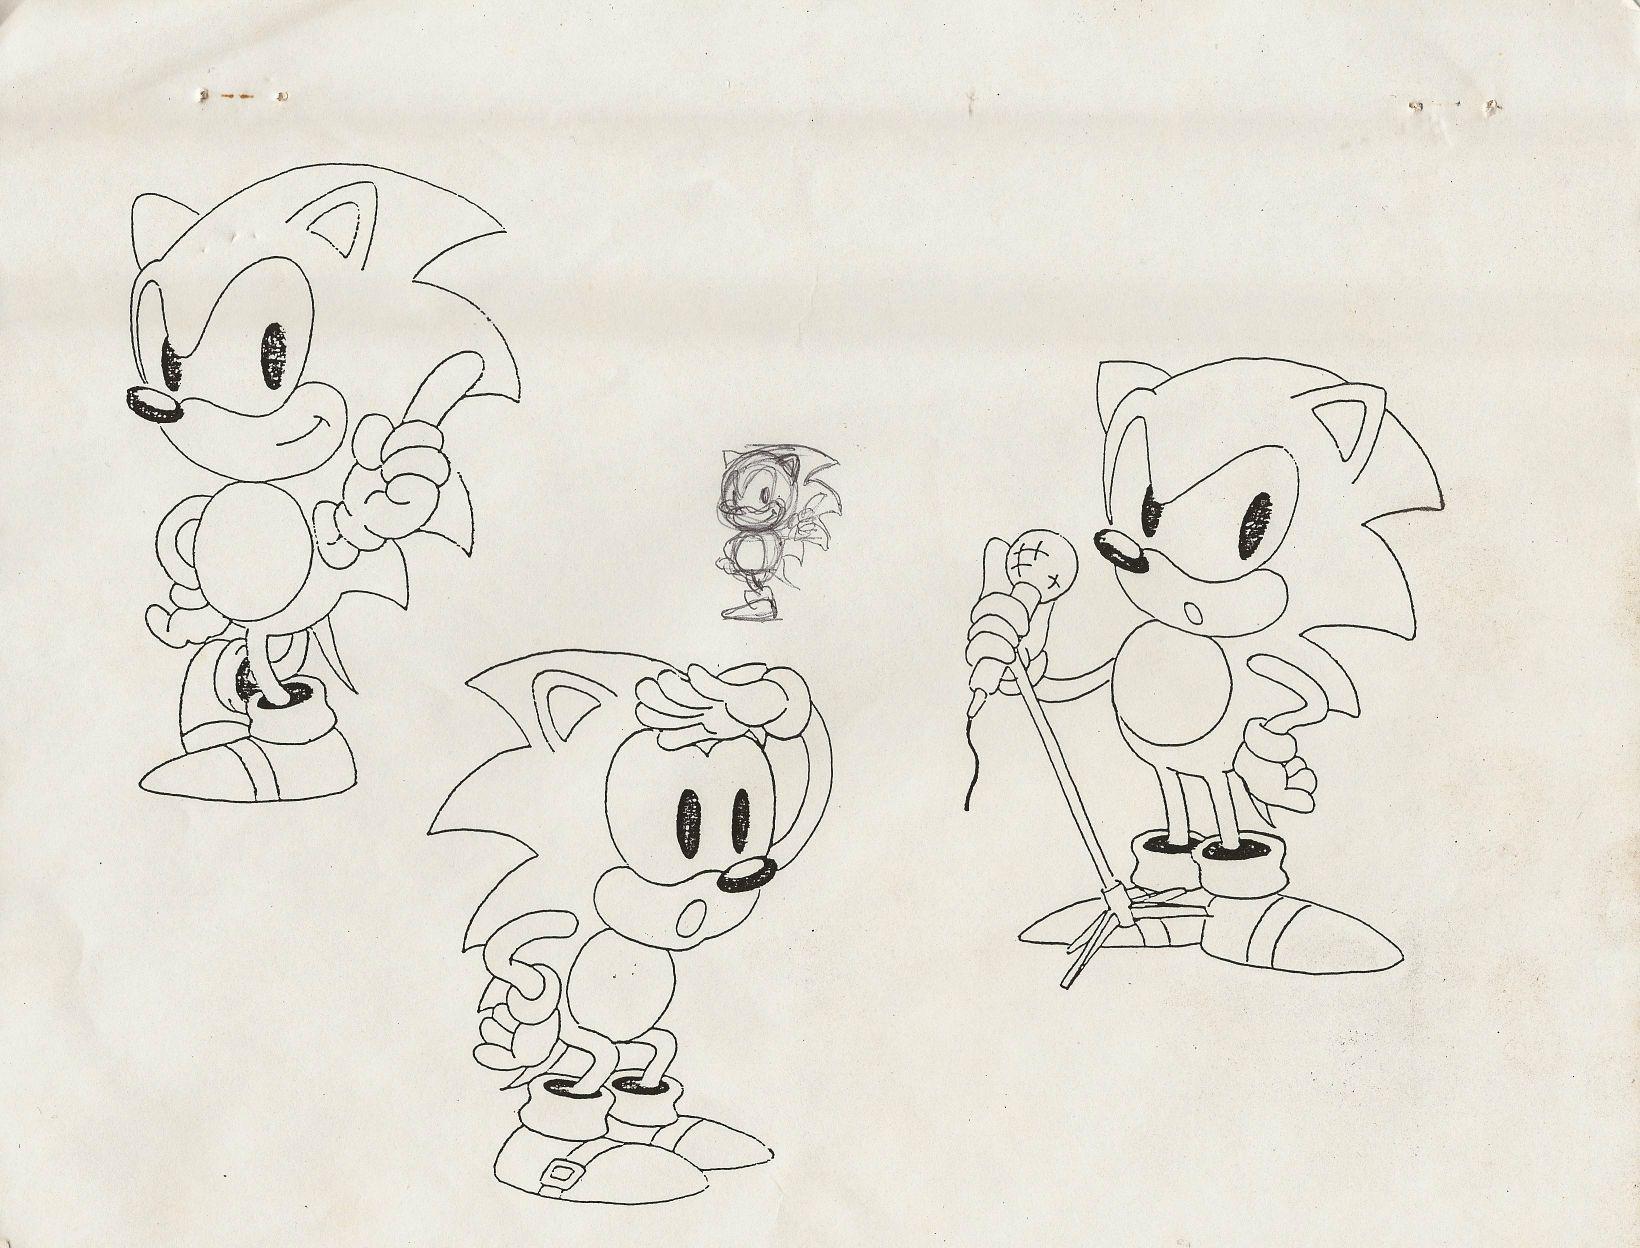 Sonicguide4.jpg